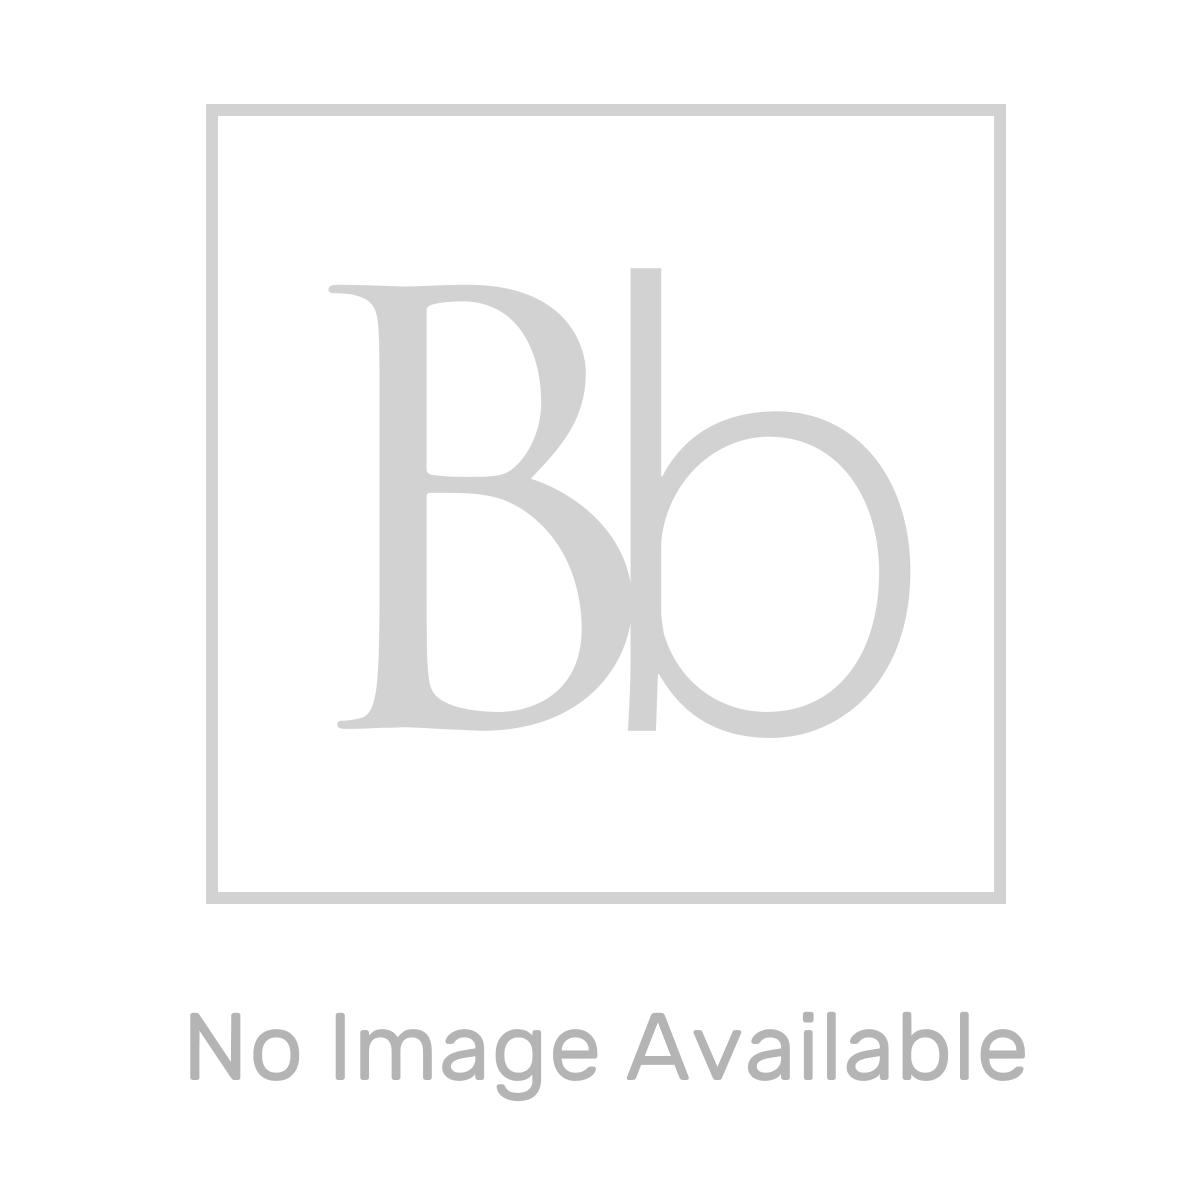 RAK Surface Charcoal Tile 600 x 600mm